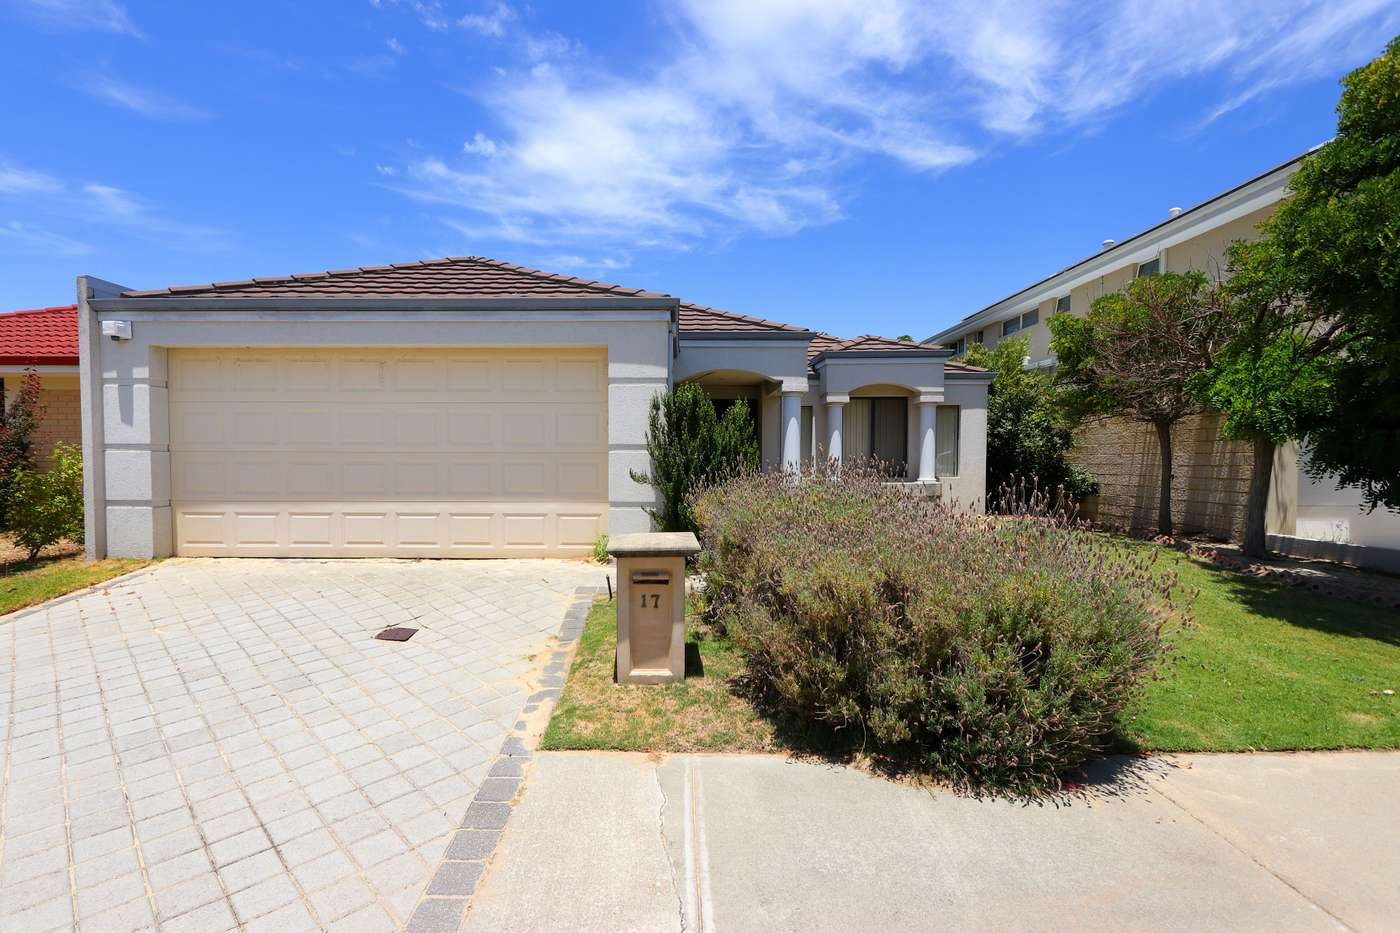 Main view of Homely house listing, 17 Dakota Avenue, Maylands, WA 6051